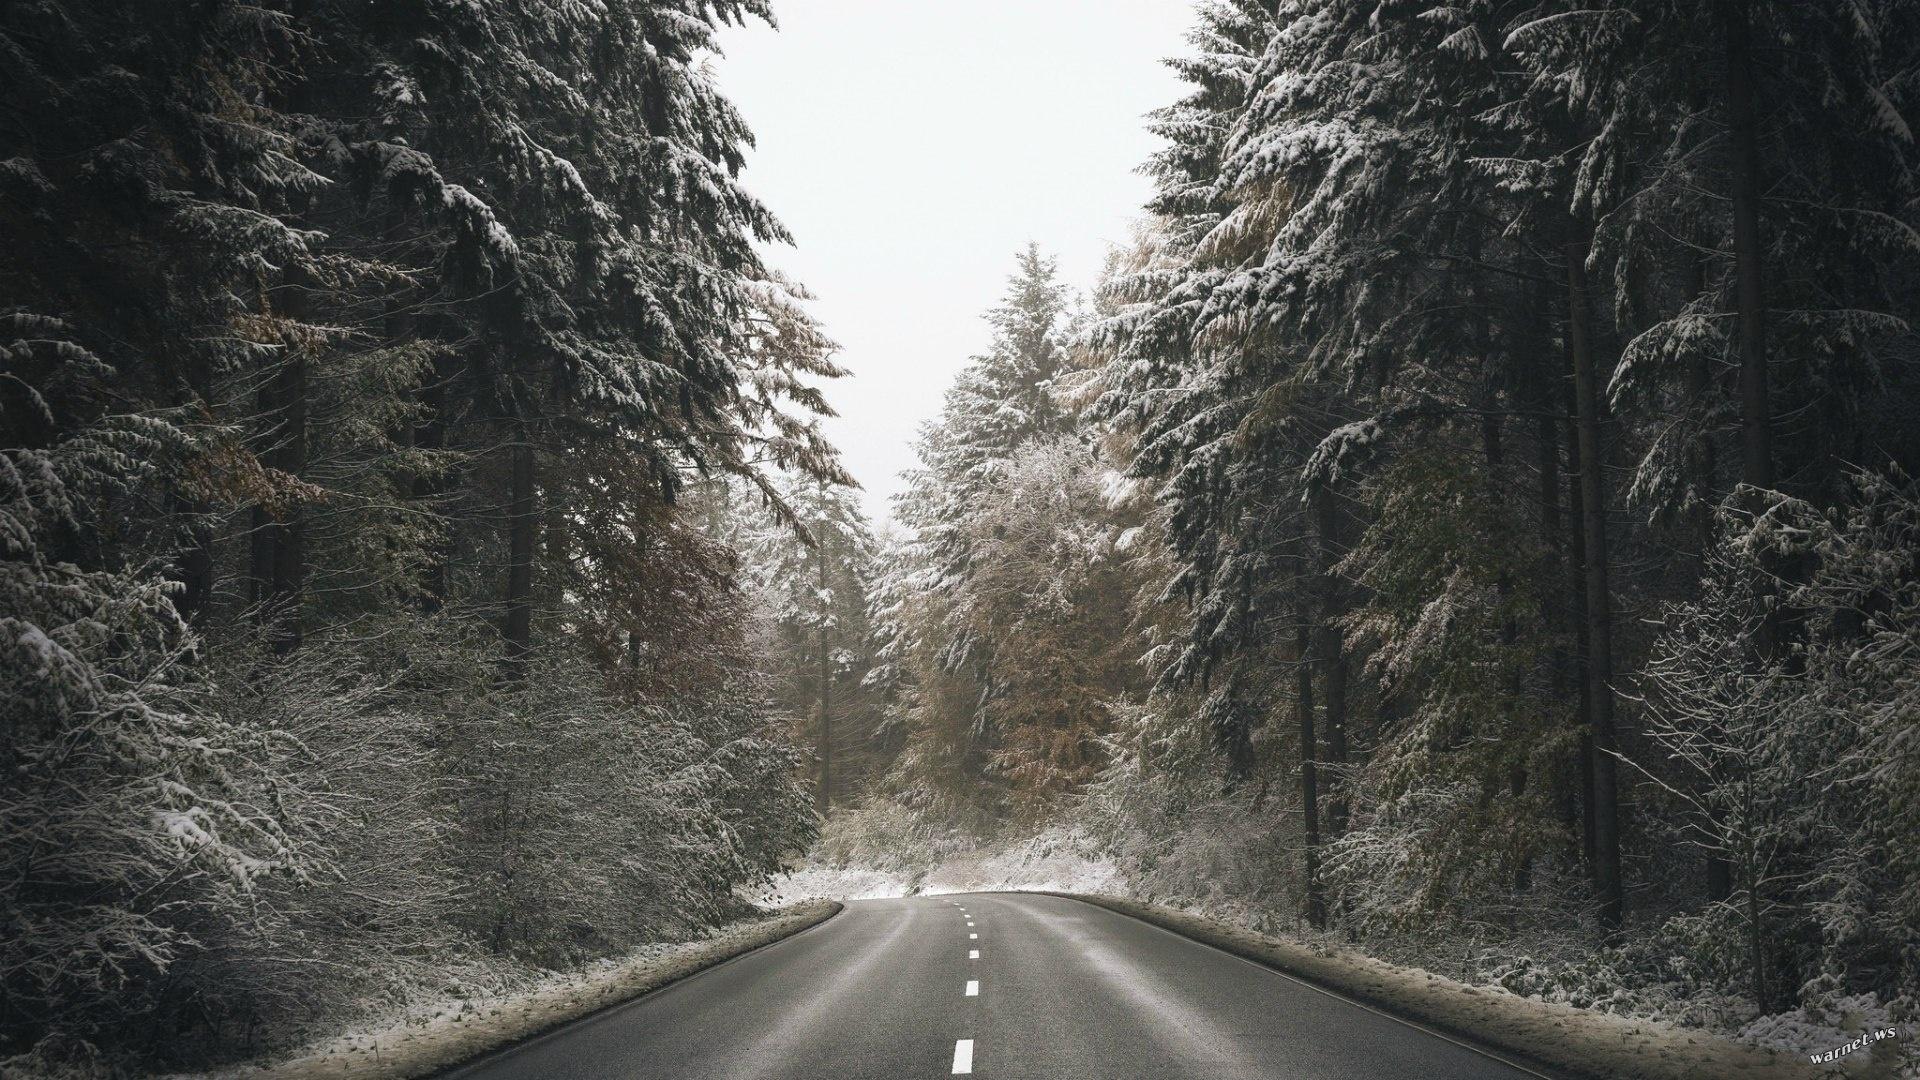 Winter Road Image